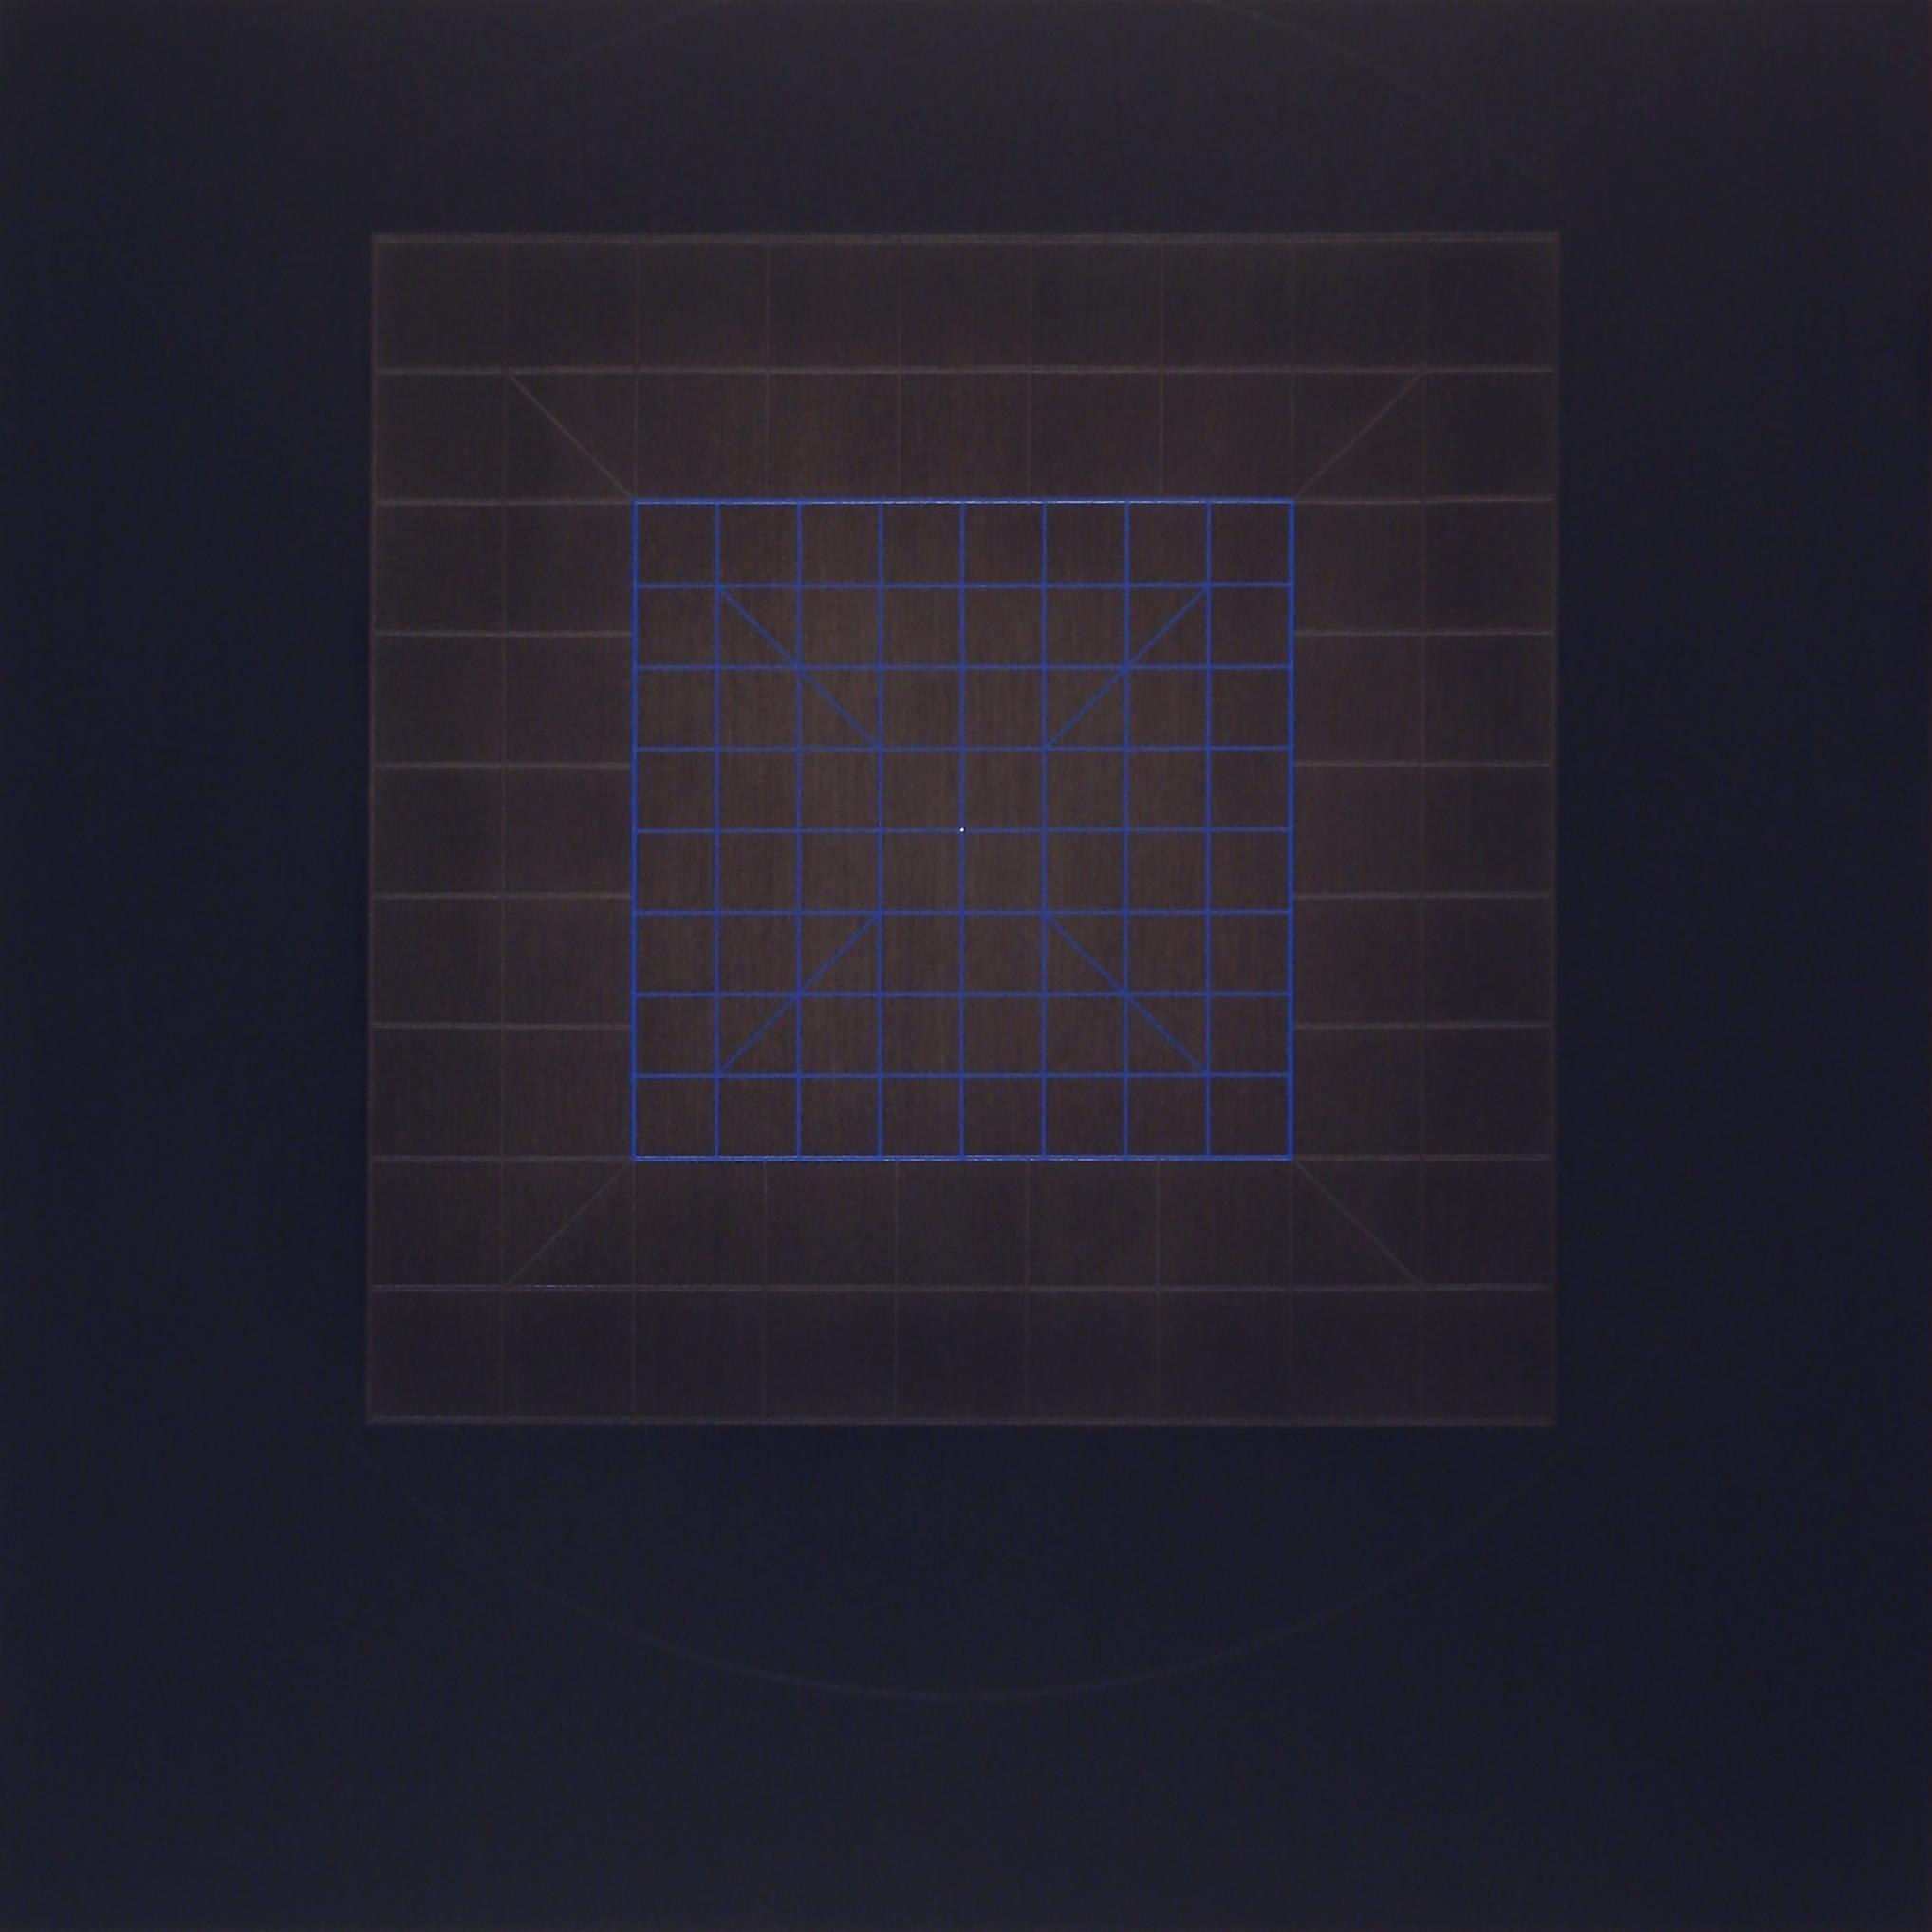 Catharsis-cosmometry-ativarna-brahmana [Diptych-2]-[20170927], 2017, acrylic on canvas, 17 3/4 x 15 3/4 in. [75x75cm]